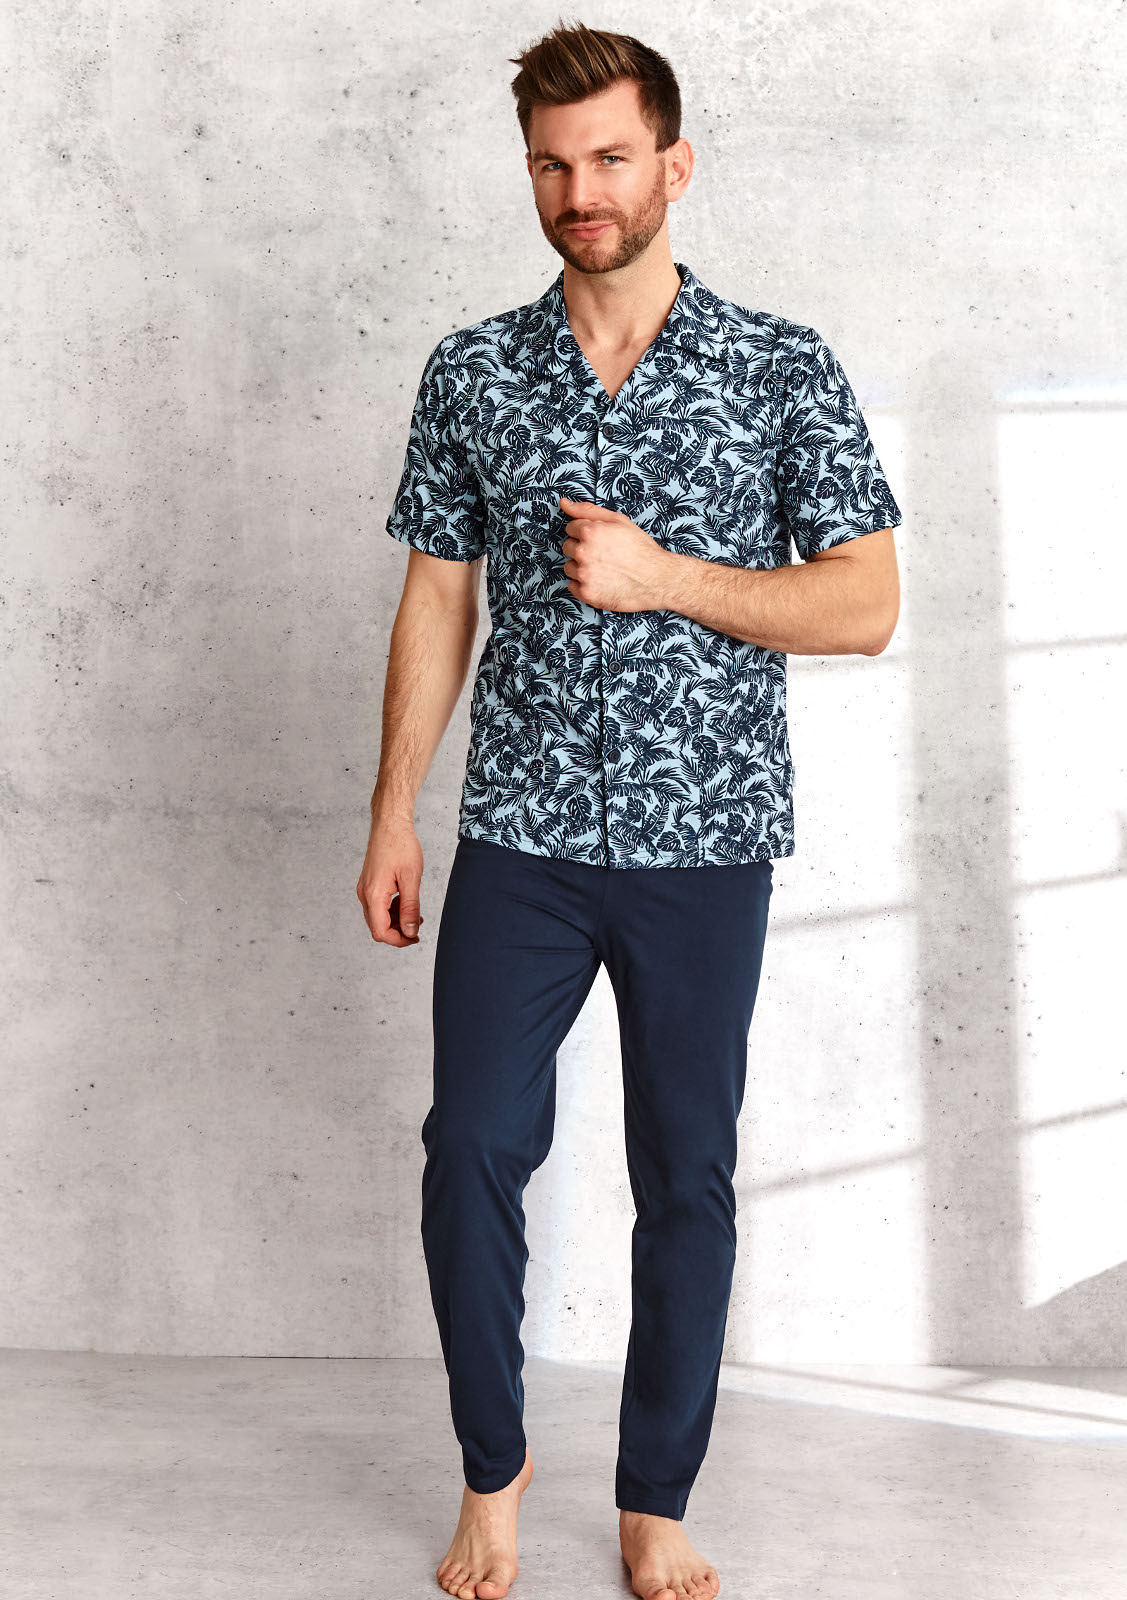 Pánske pyžamo Taro Gracjan 954 Kr / r 2XL-3XL L'21 modro-tmavo modrá XXL